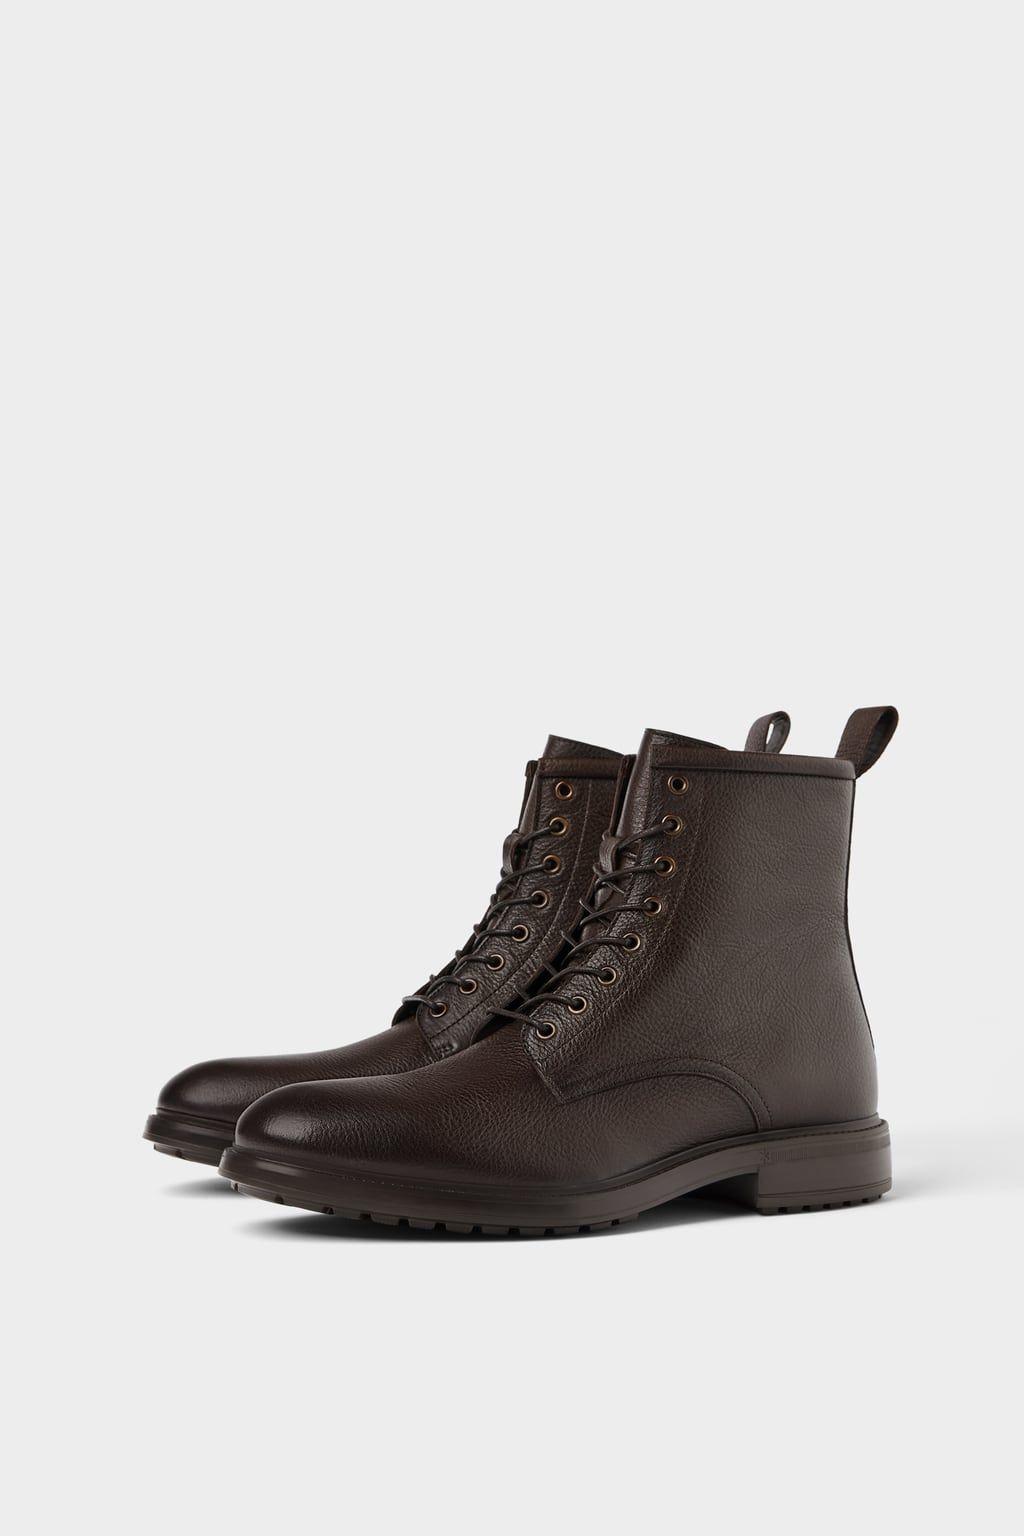 Leather Boots Zara Light Sepatu Bot Kulit Sepatu Pria Sepatu Bot